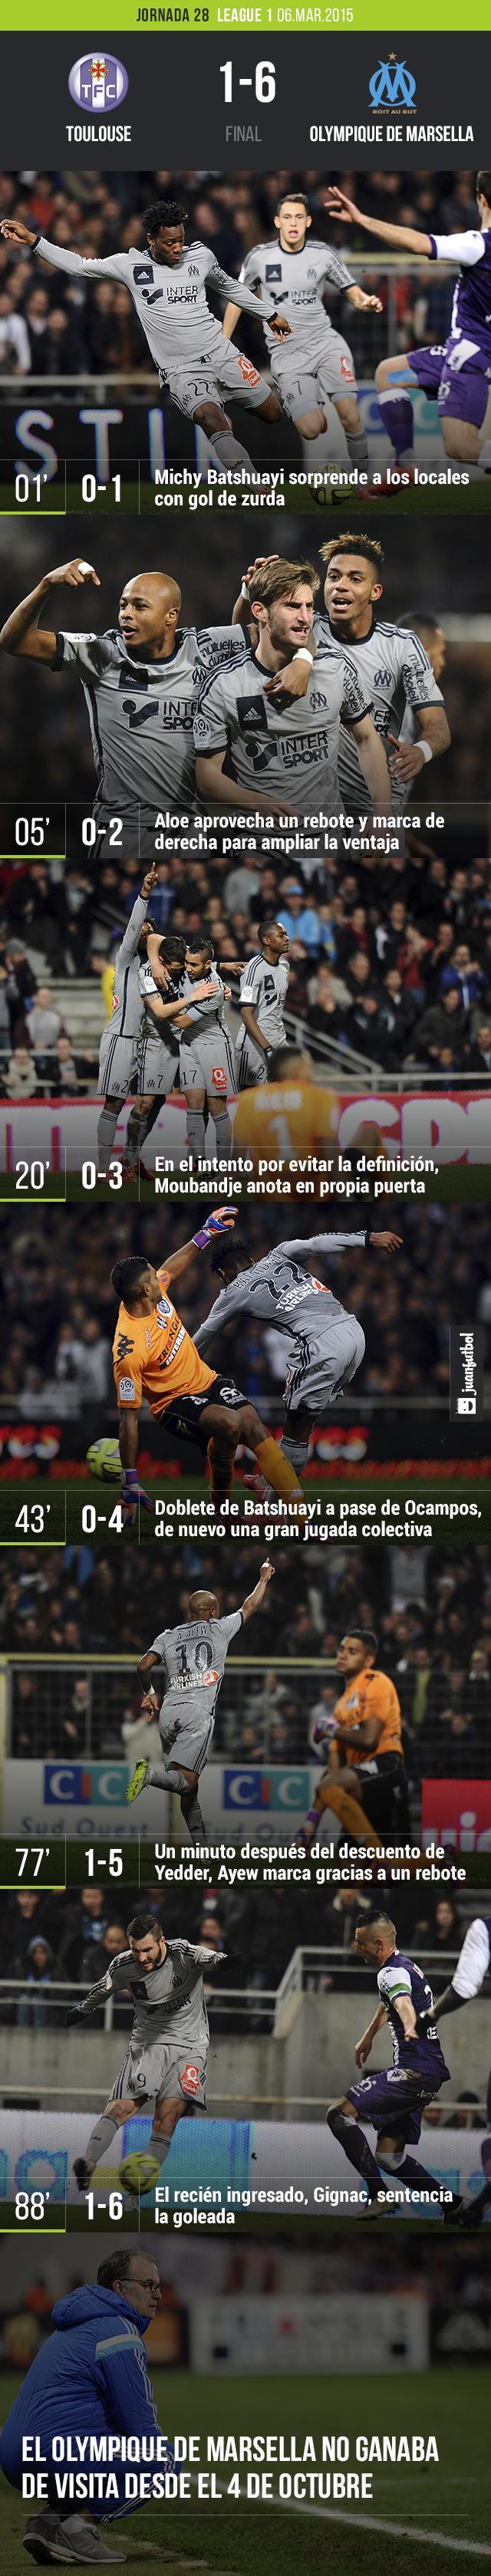 El Olympique de Marsella de Bielsa golea 6-1 al Toulouse